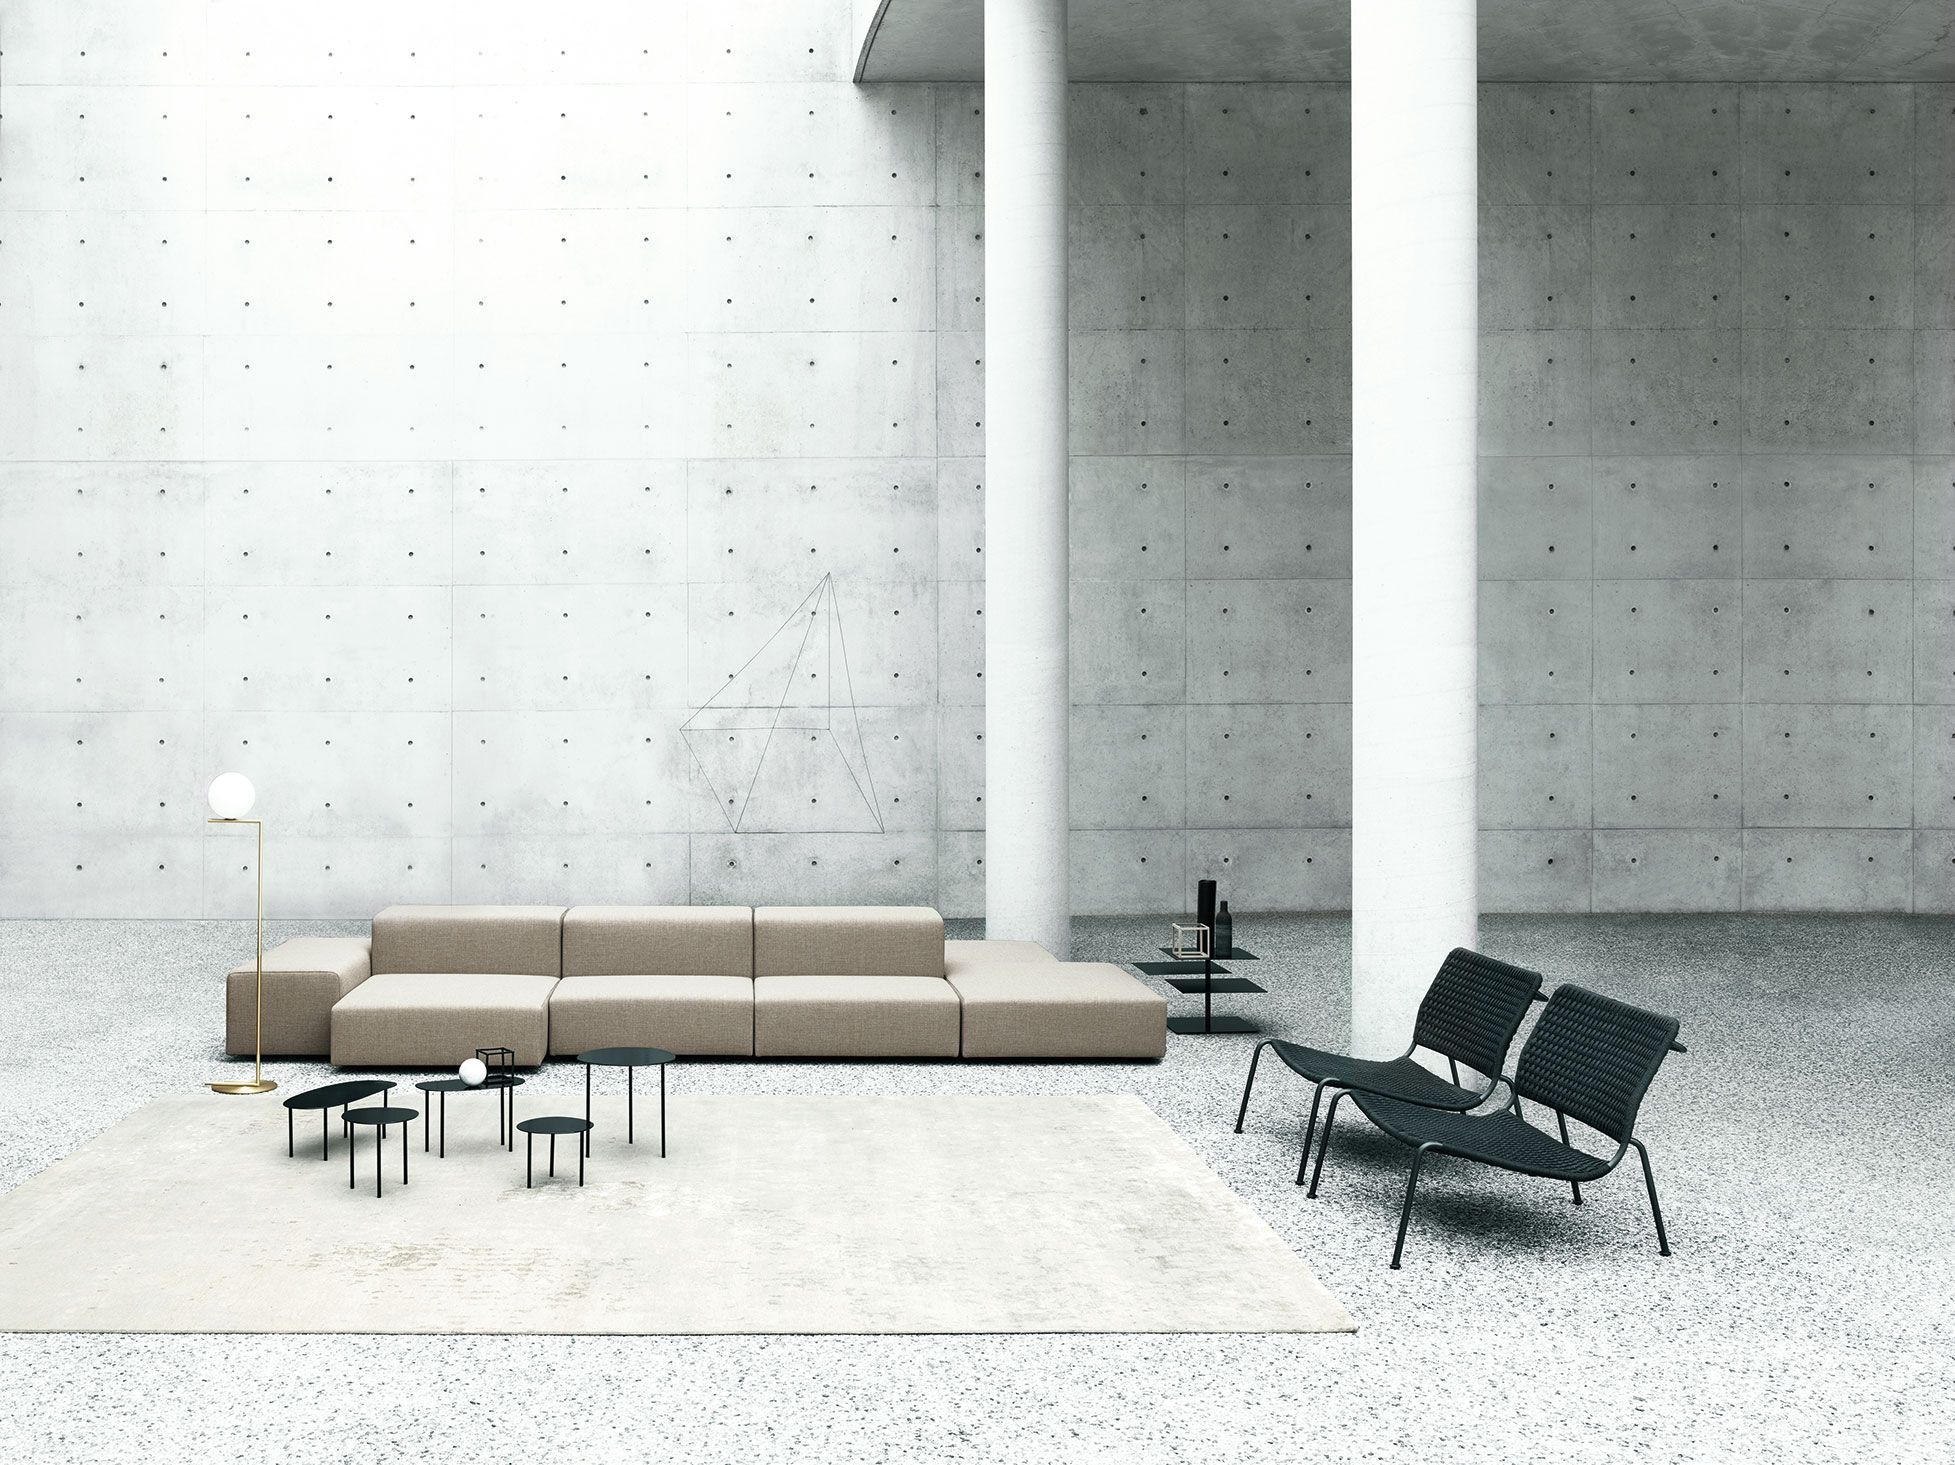 Extra Wall, Frog design Piero Lissoni, B3 low table design ...